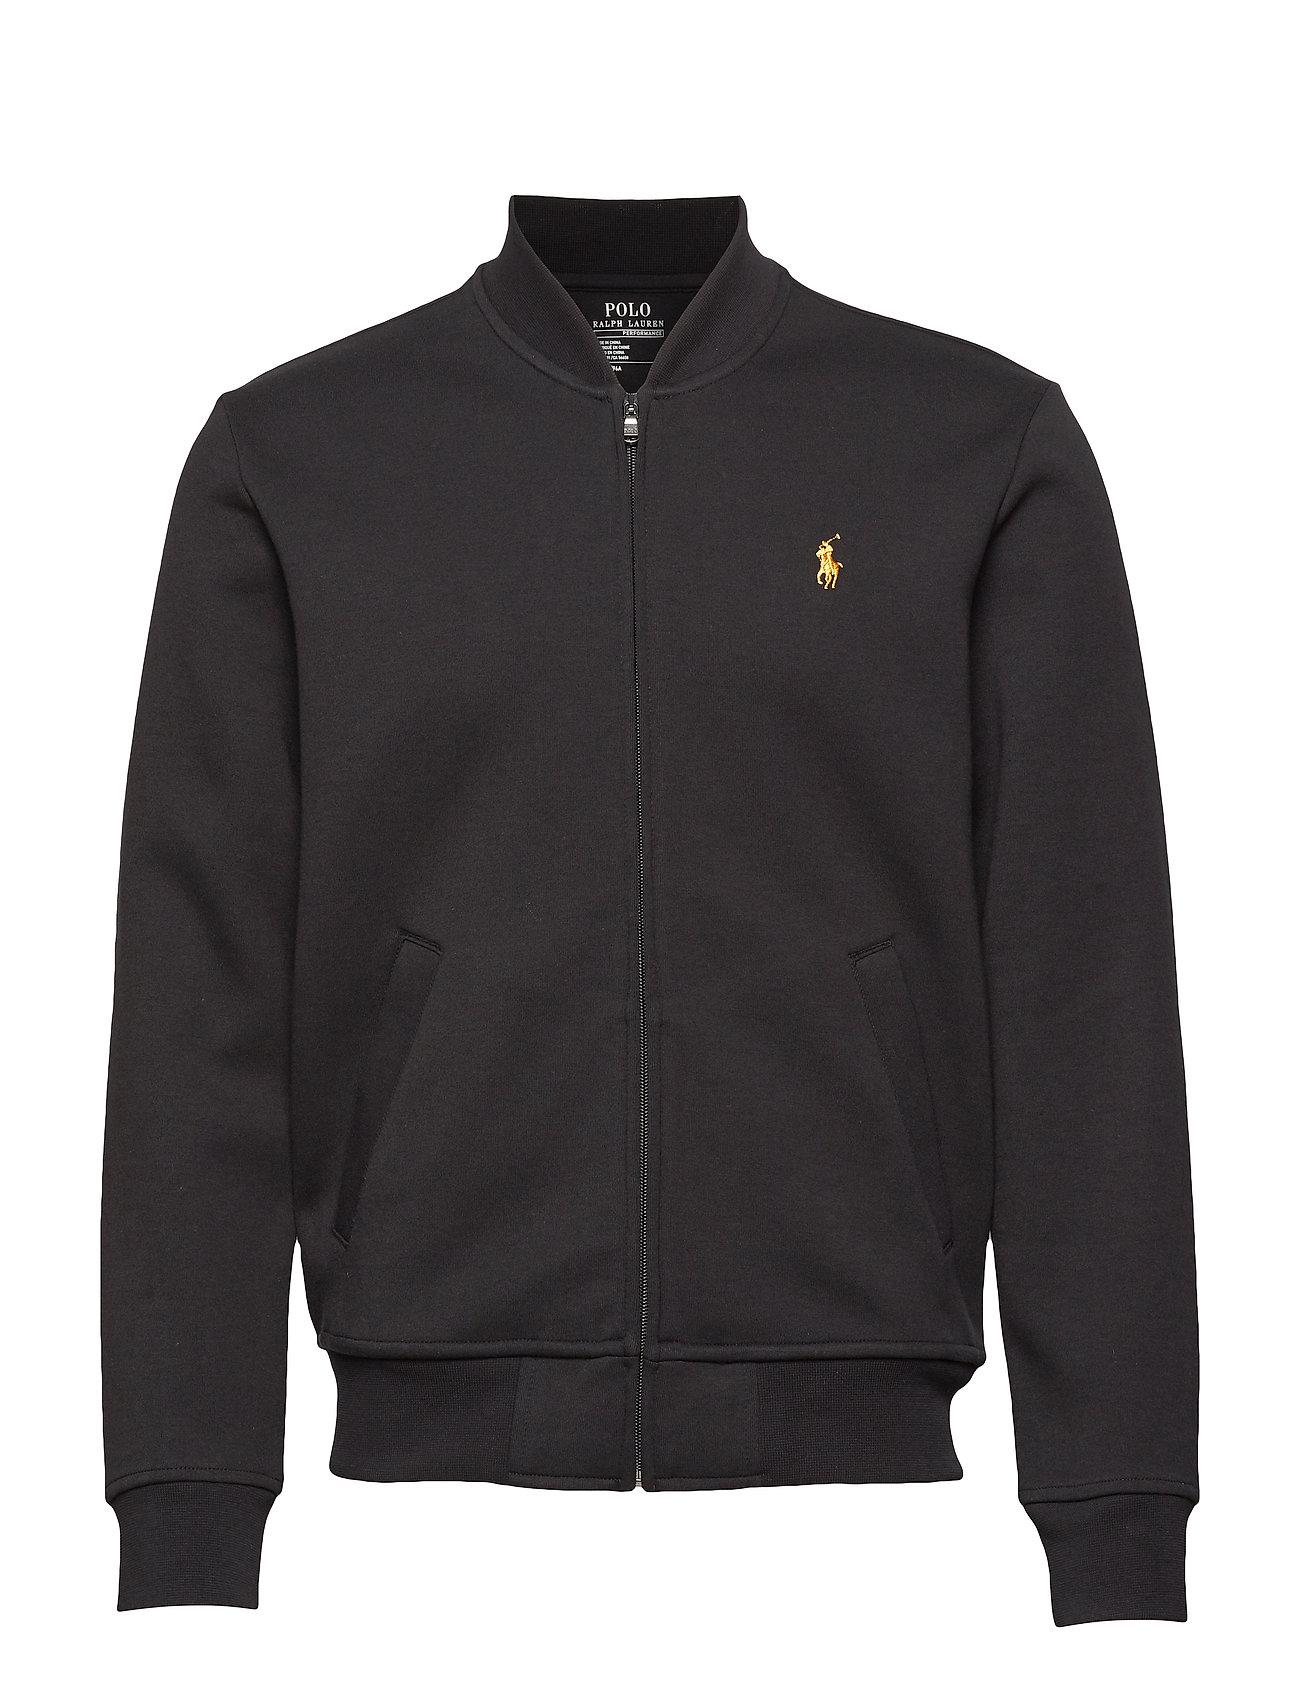 Polo Ralph Lauren Double-Knit Bomber Jacket - POLO BLACK/GOLD P